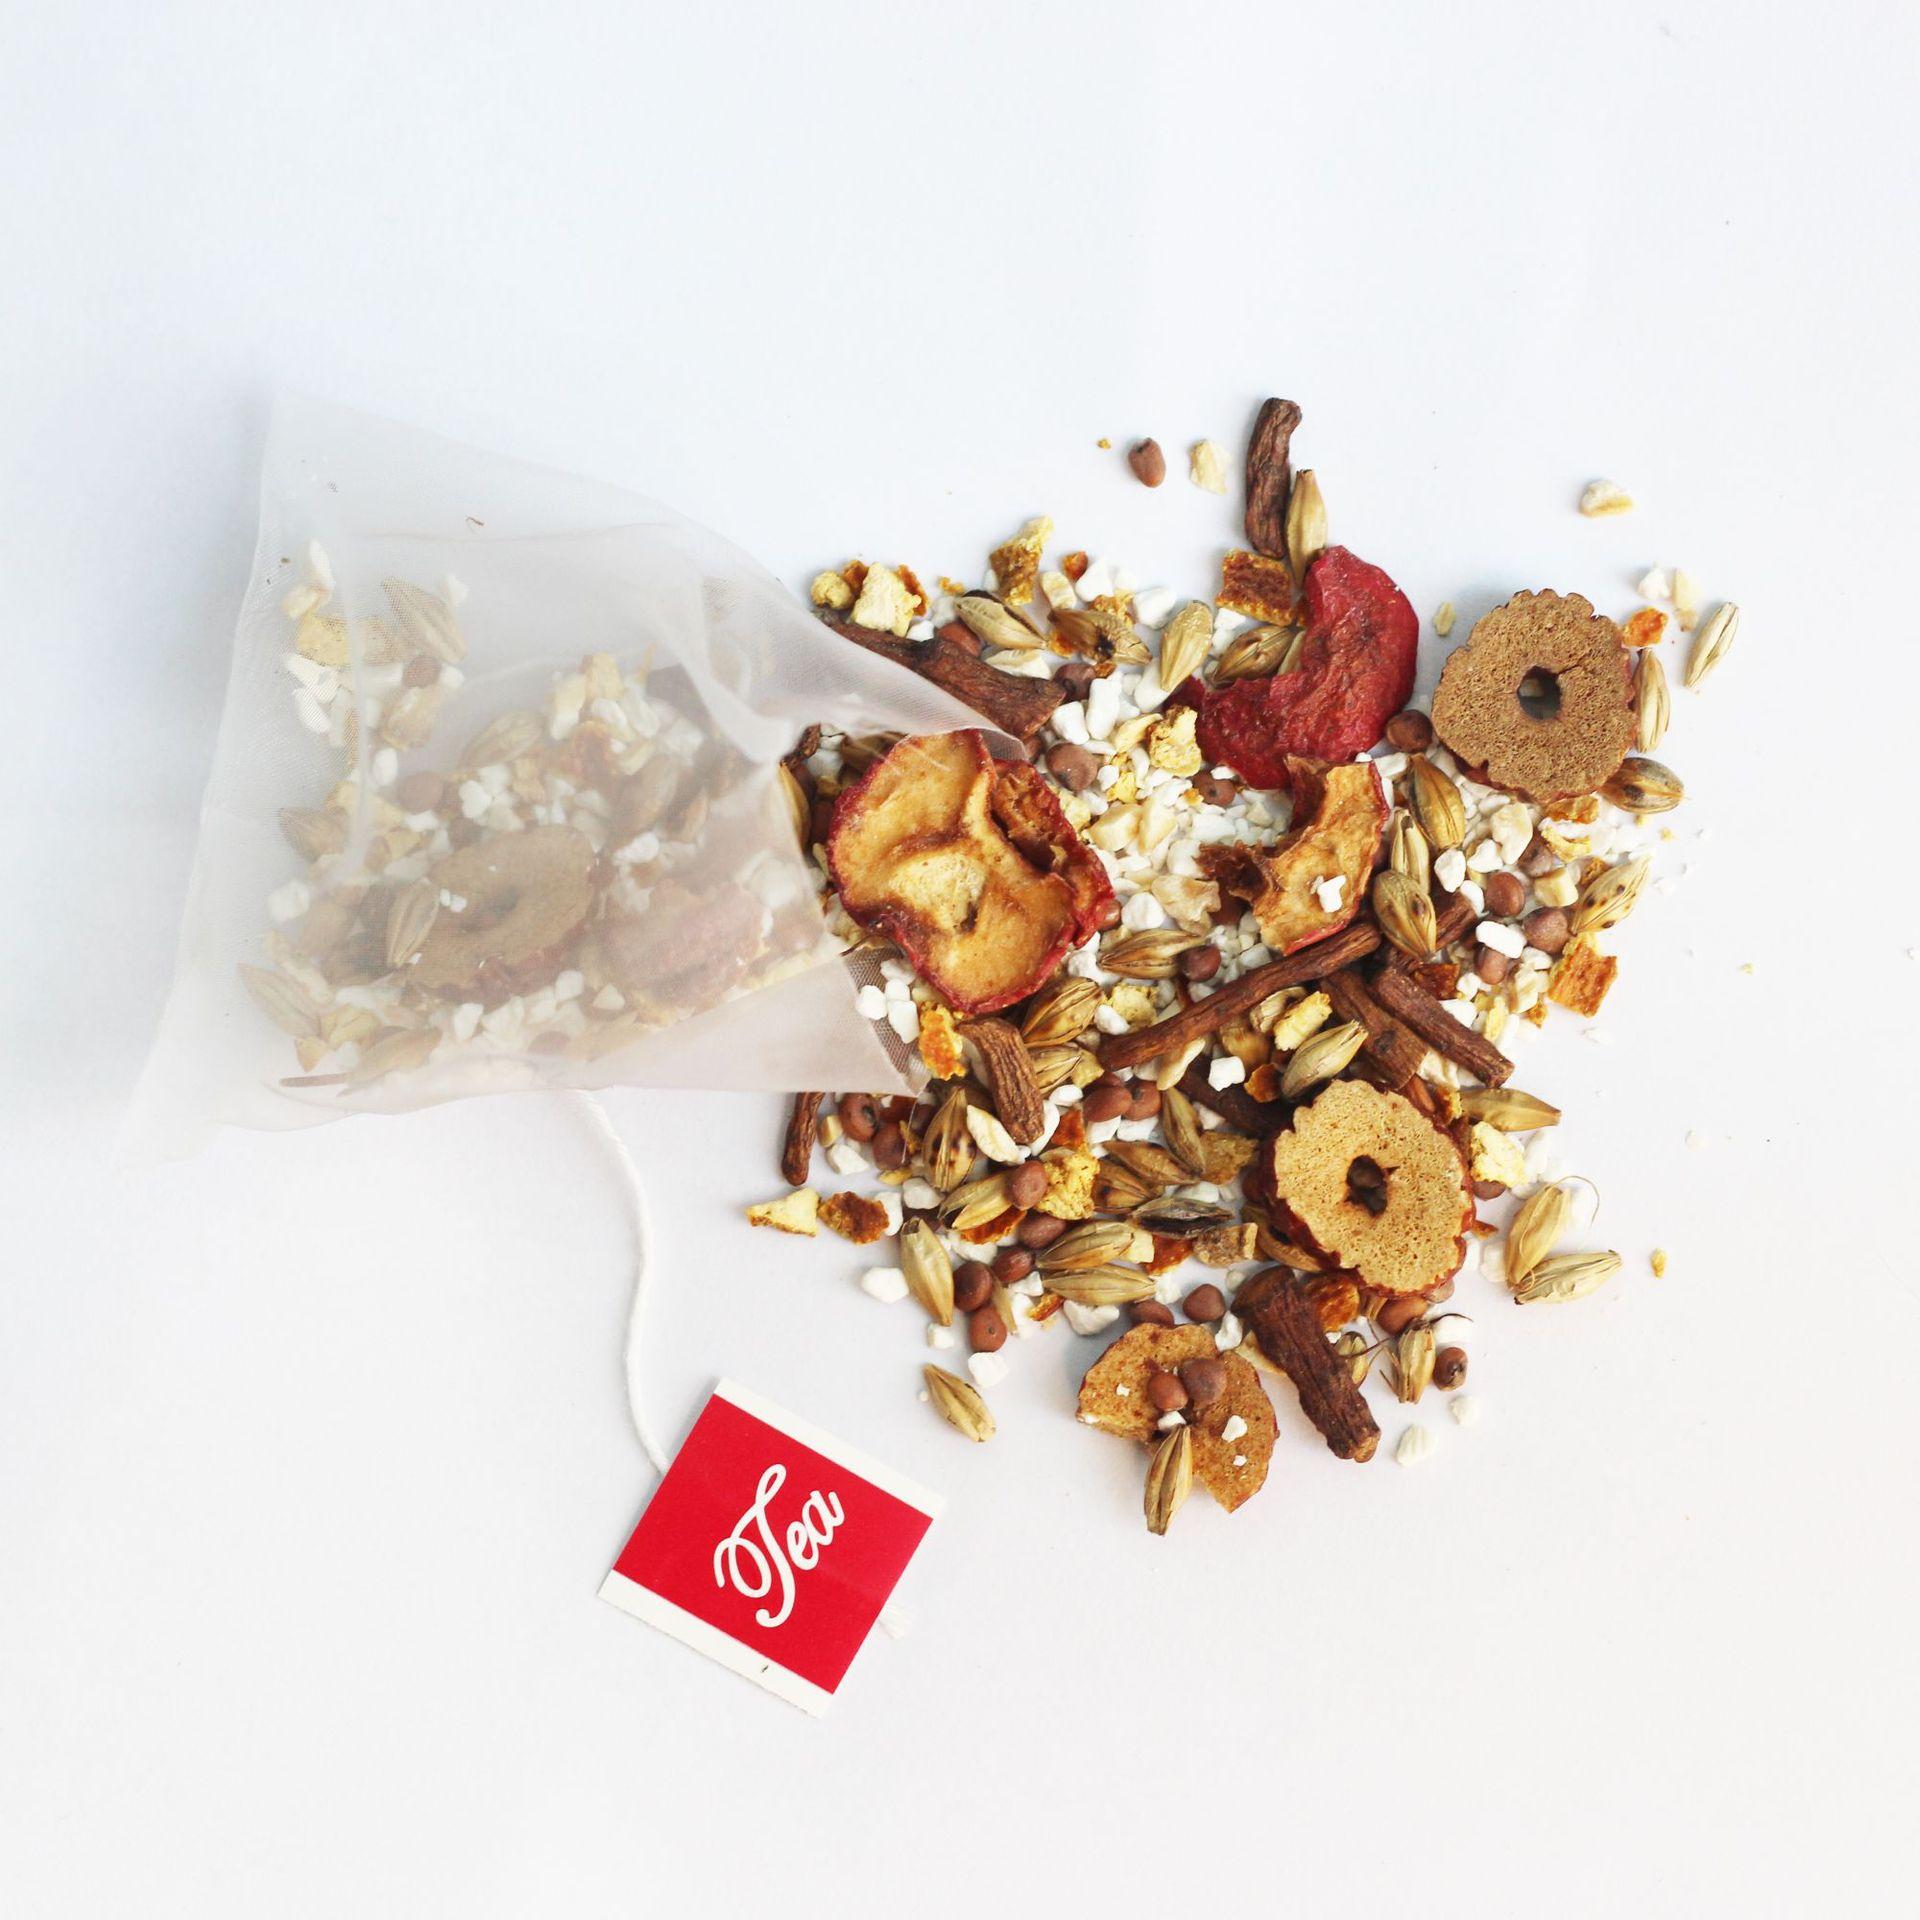 Private Label Slimming Belly Slimming Tea Hawthorn Malt Herbal Tea Bag For Detoxification - 4uTea | 4uTea.com